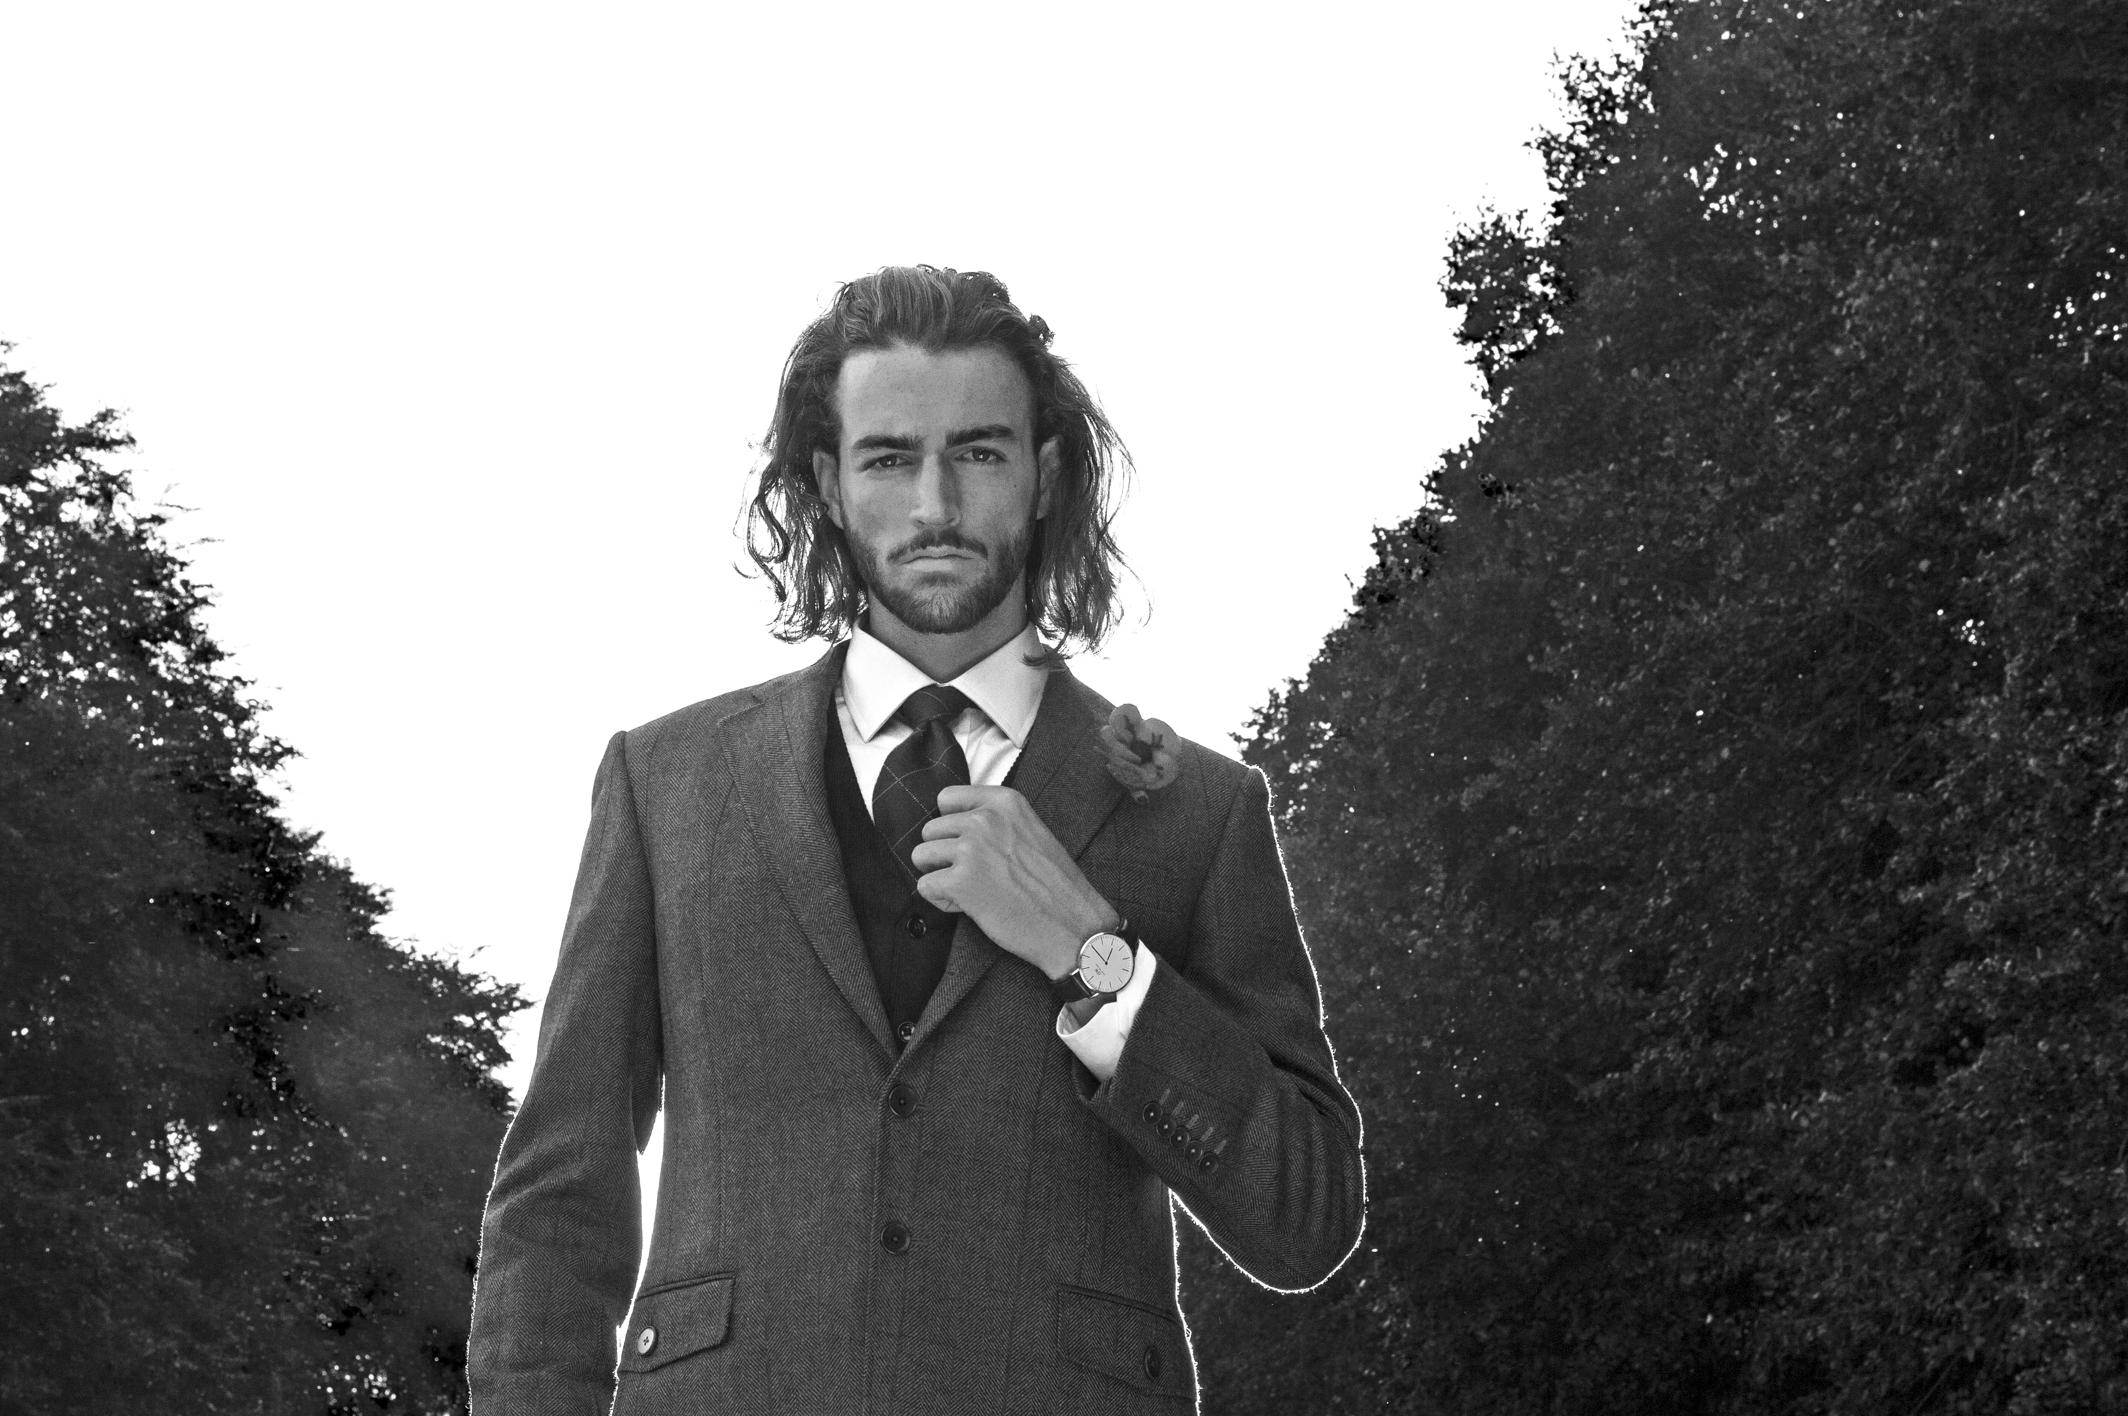 Fashion photography for roomten by Farnham, Surrey portrait photographer James Muller